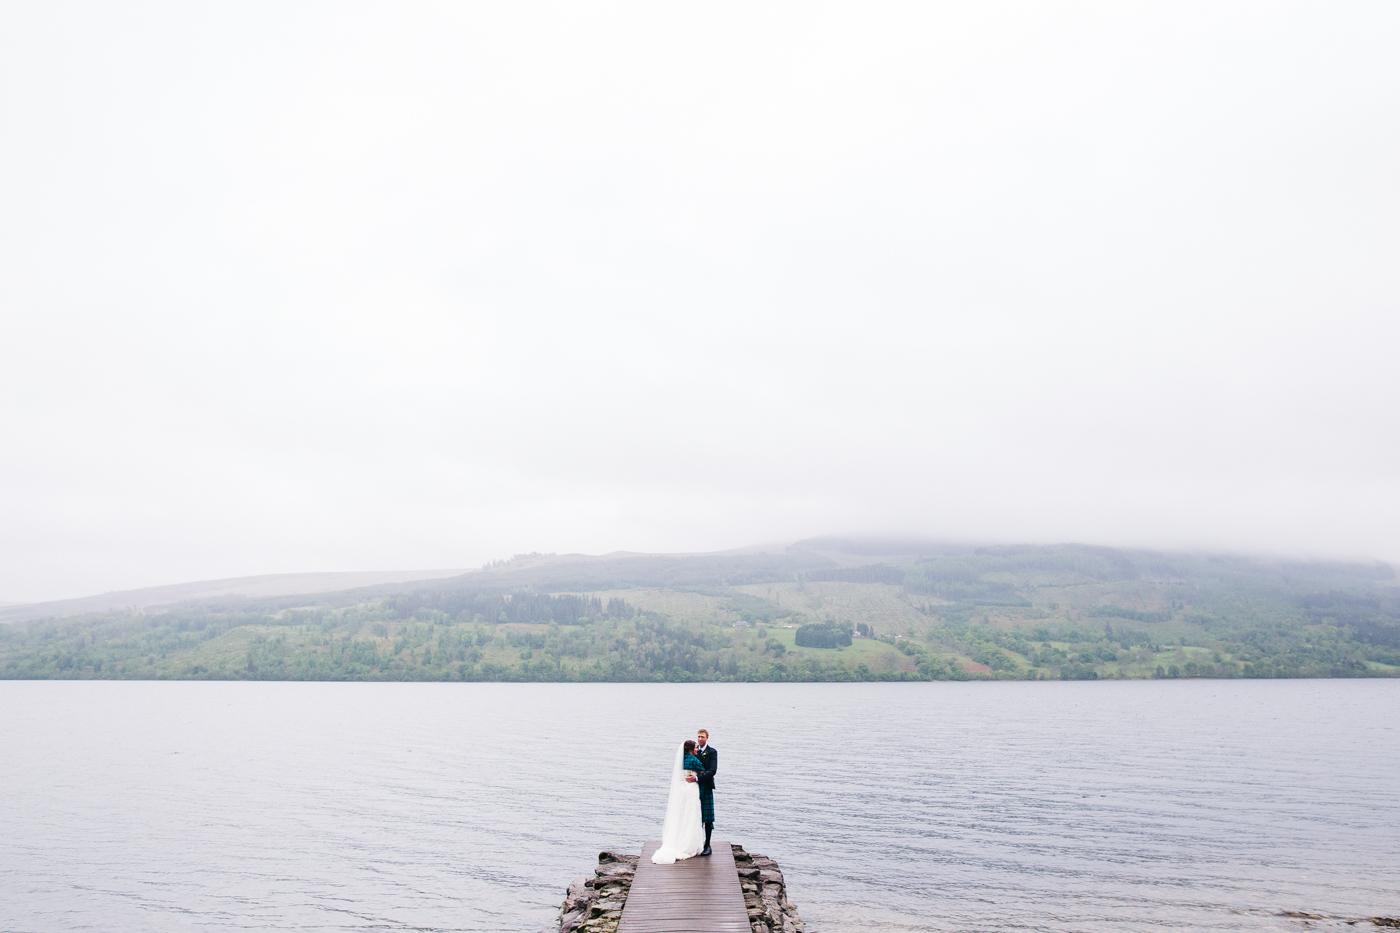 scottish-wedding-trossachs-loch-tay-highlannds-relaxed-photography-photographer-0039.jpg